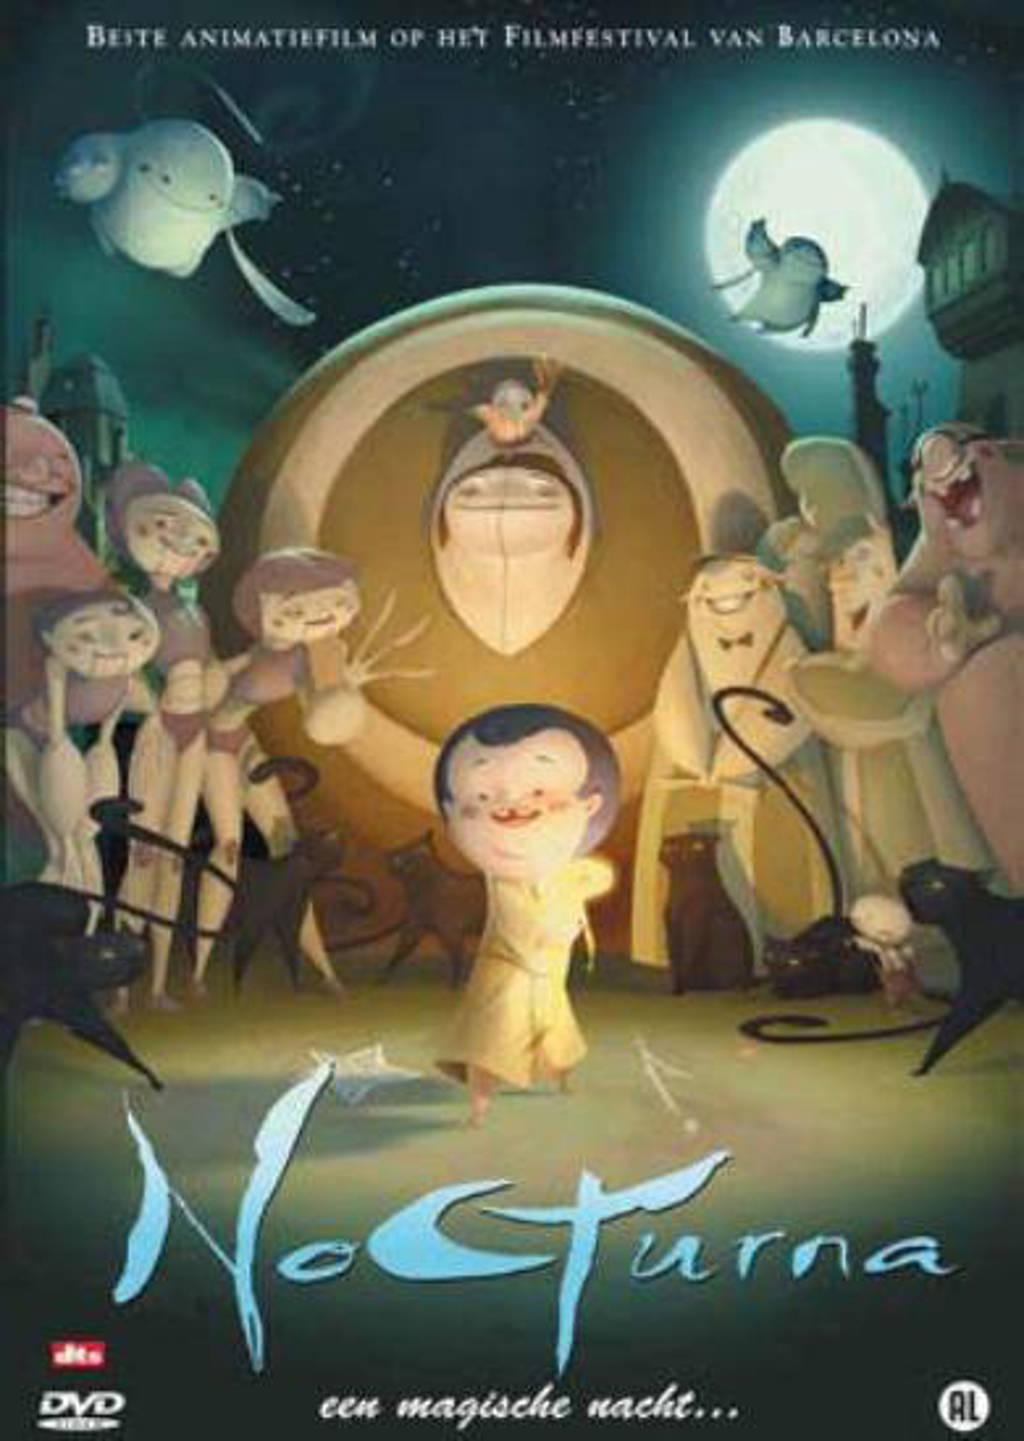 Nocturna (DVD)